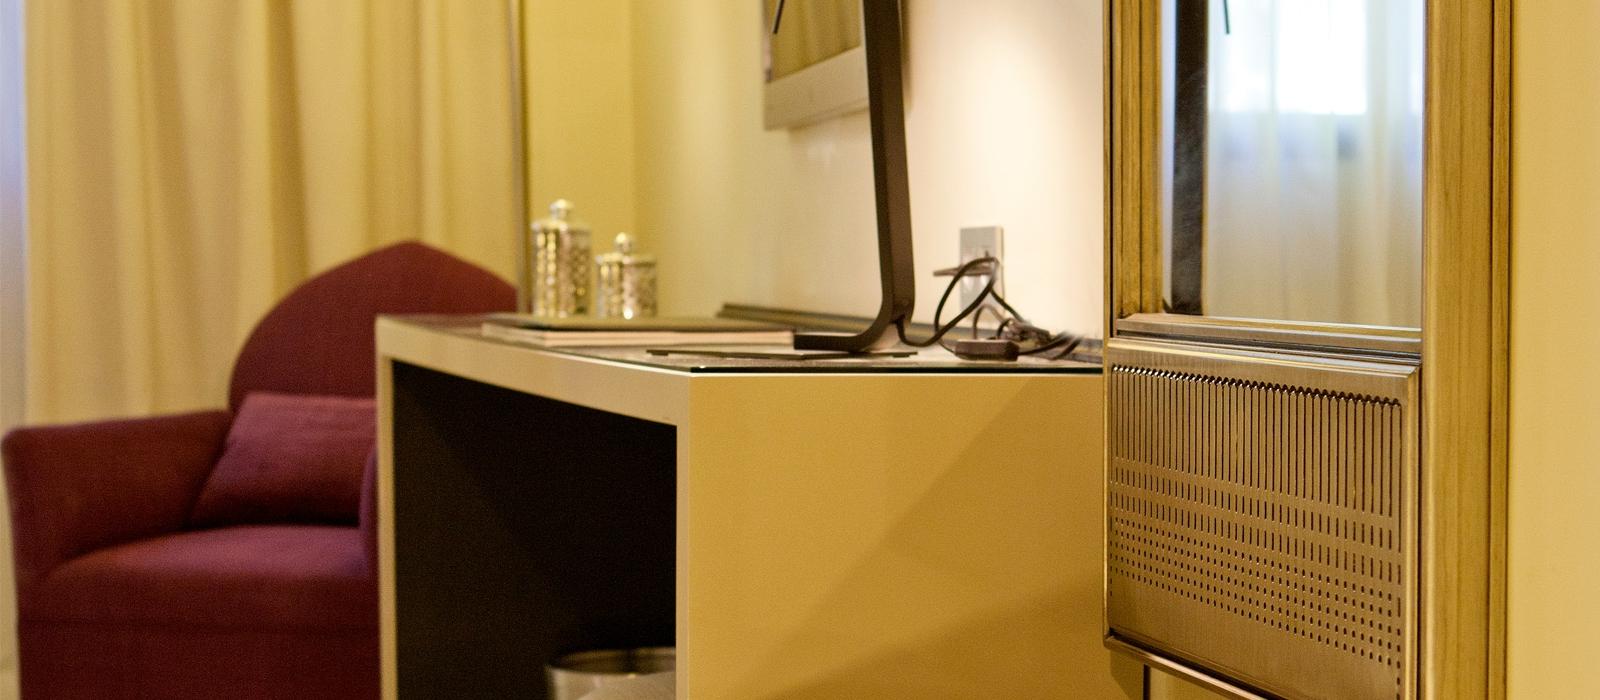 Chambre Double - Chambres Hôtel Grenade Albaicín - Vincci Hoteles